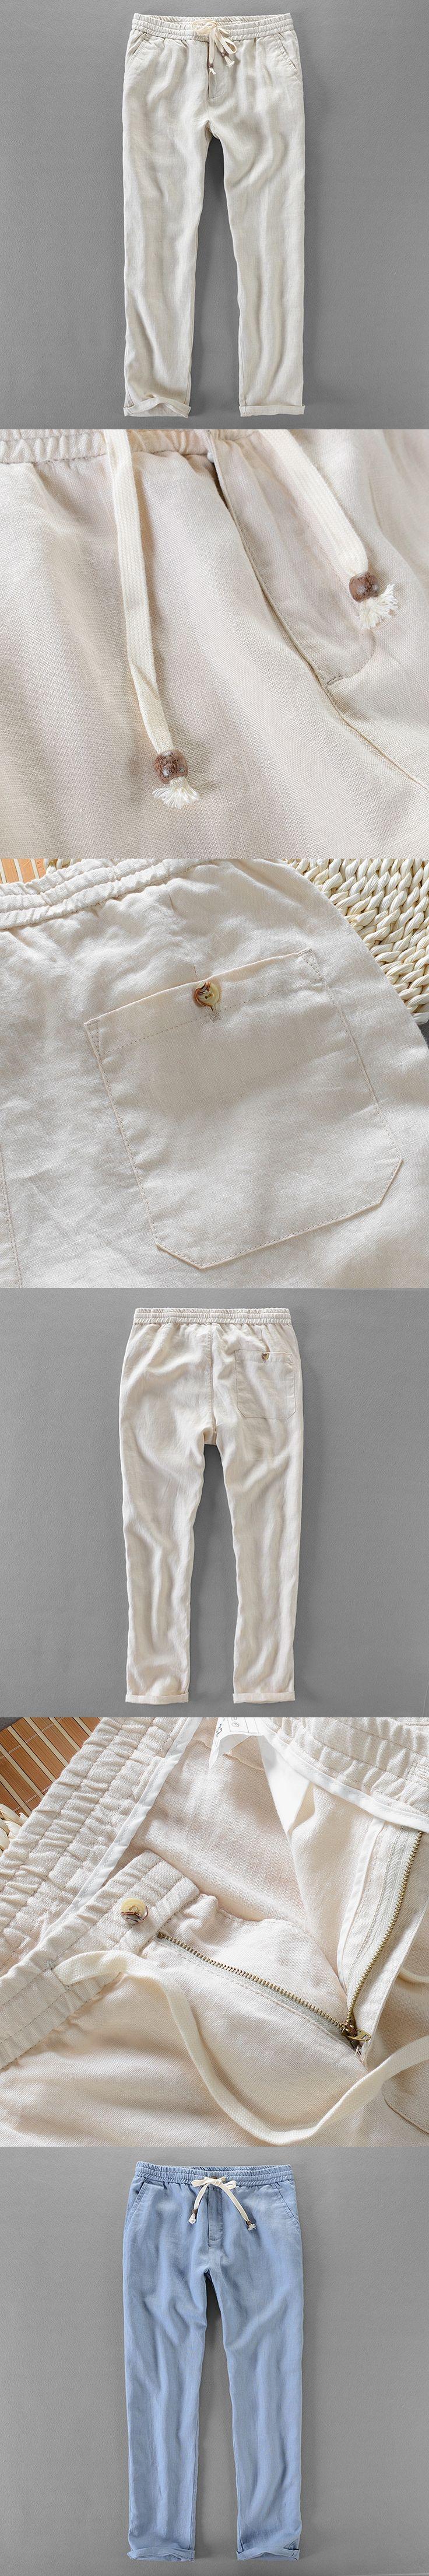 Suehaiwe's brand linen pants men spring clothing trousers men long fashion mens pants elastic waist trousers mens pantalon 40siz